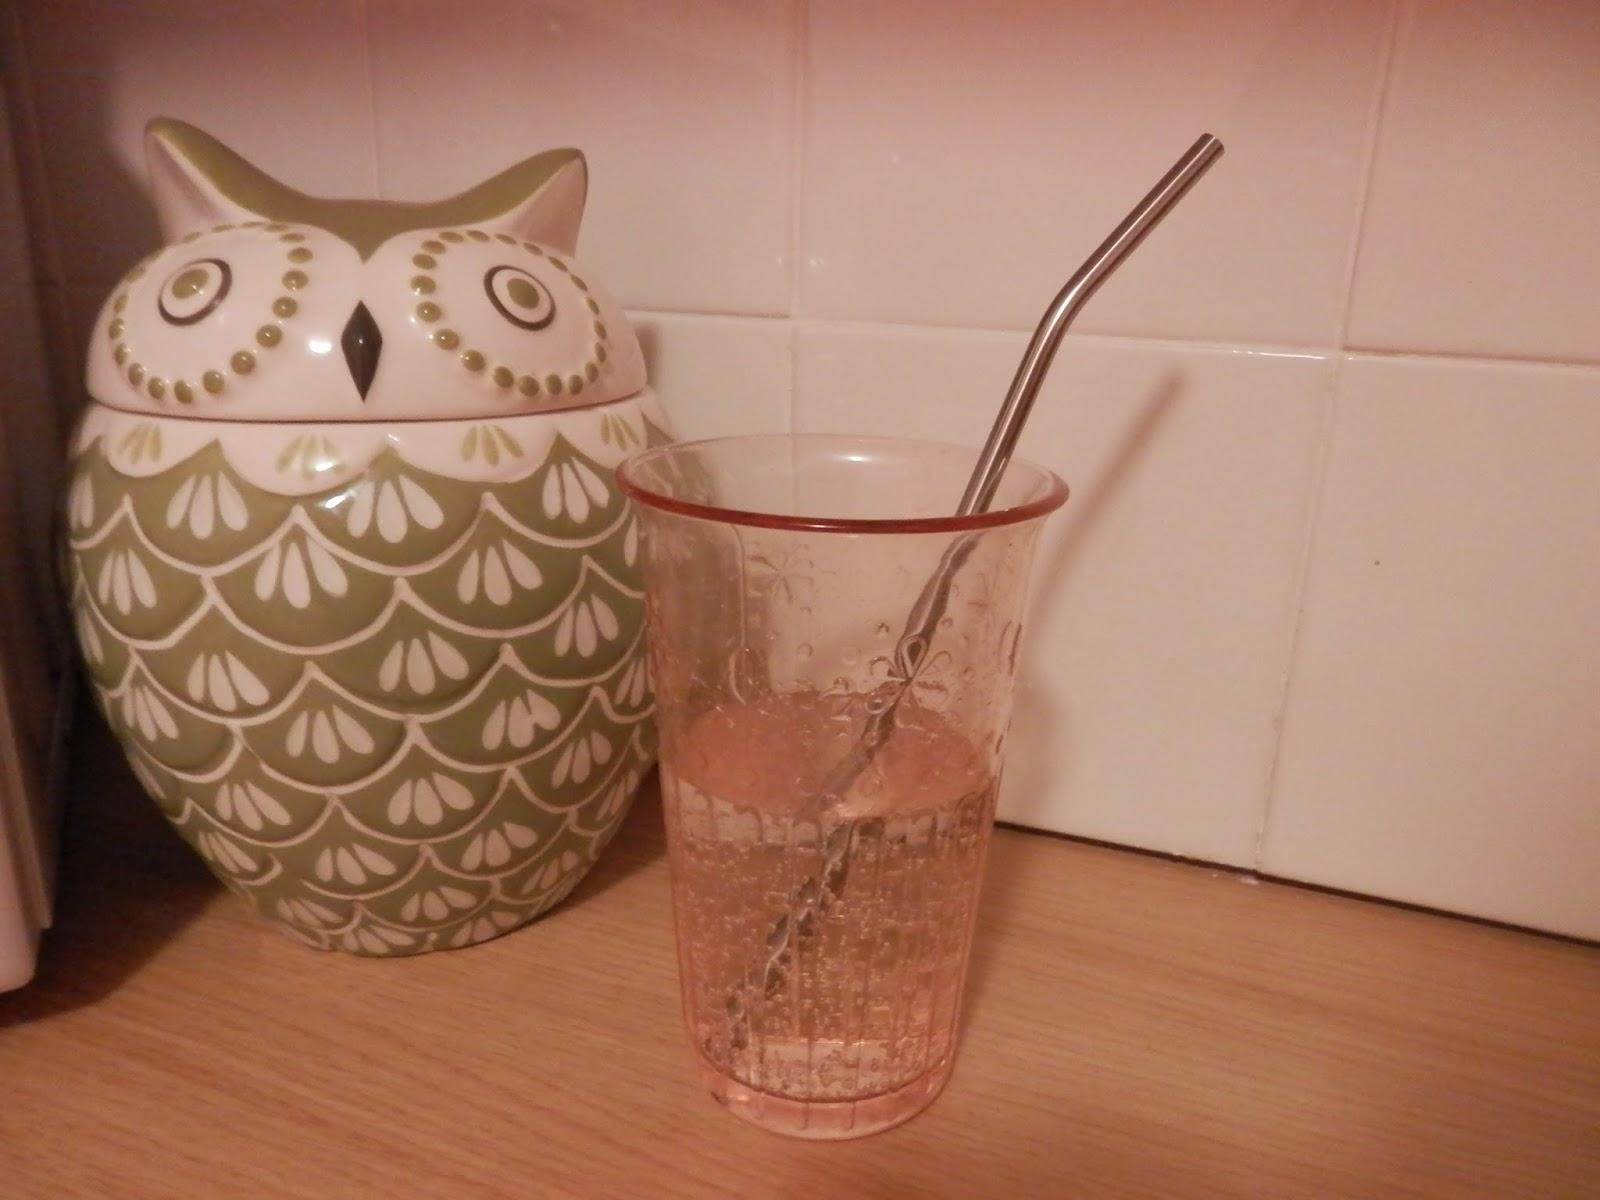 Stainless Steel Drinking Straw secondhandsusie.blogspot.co.uk